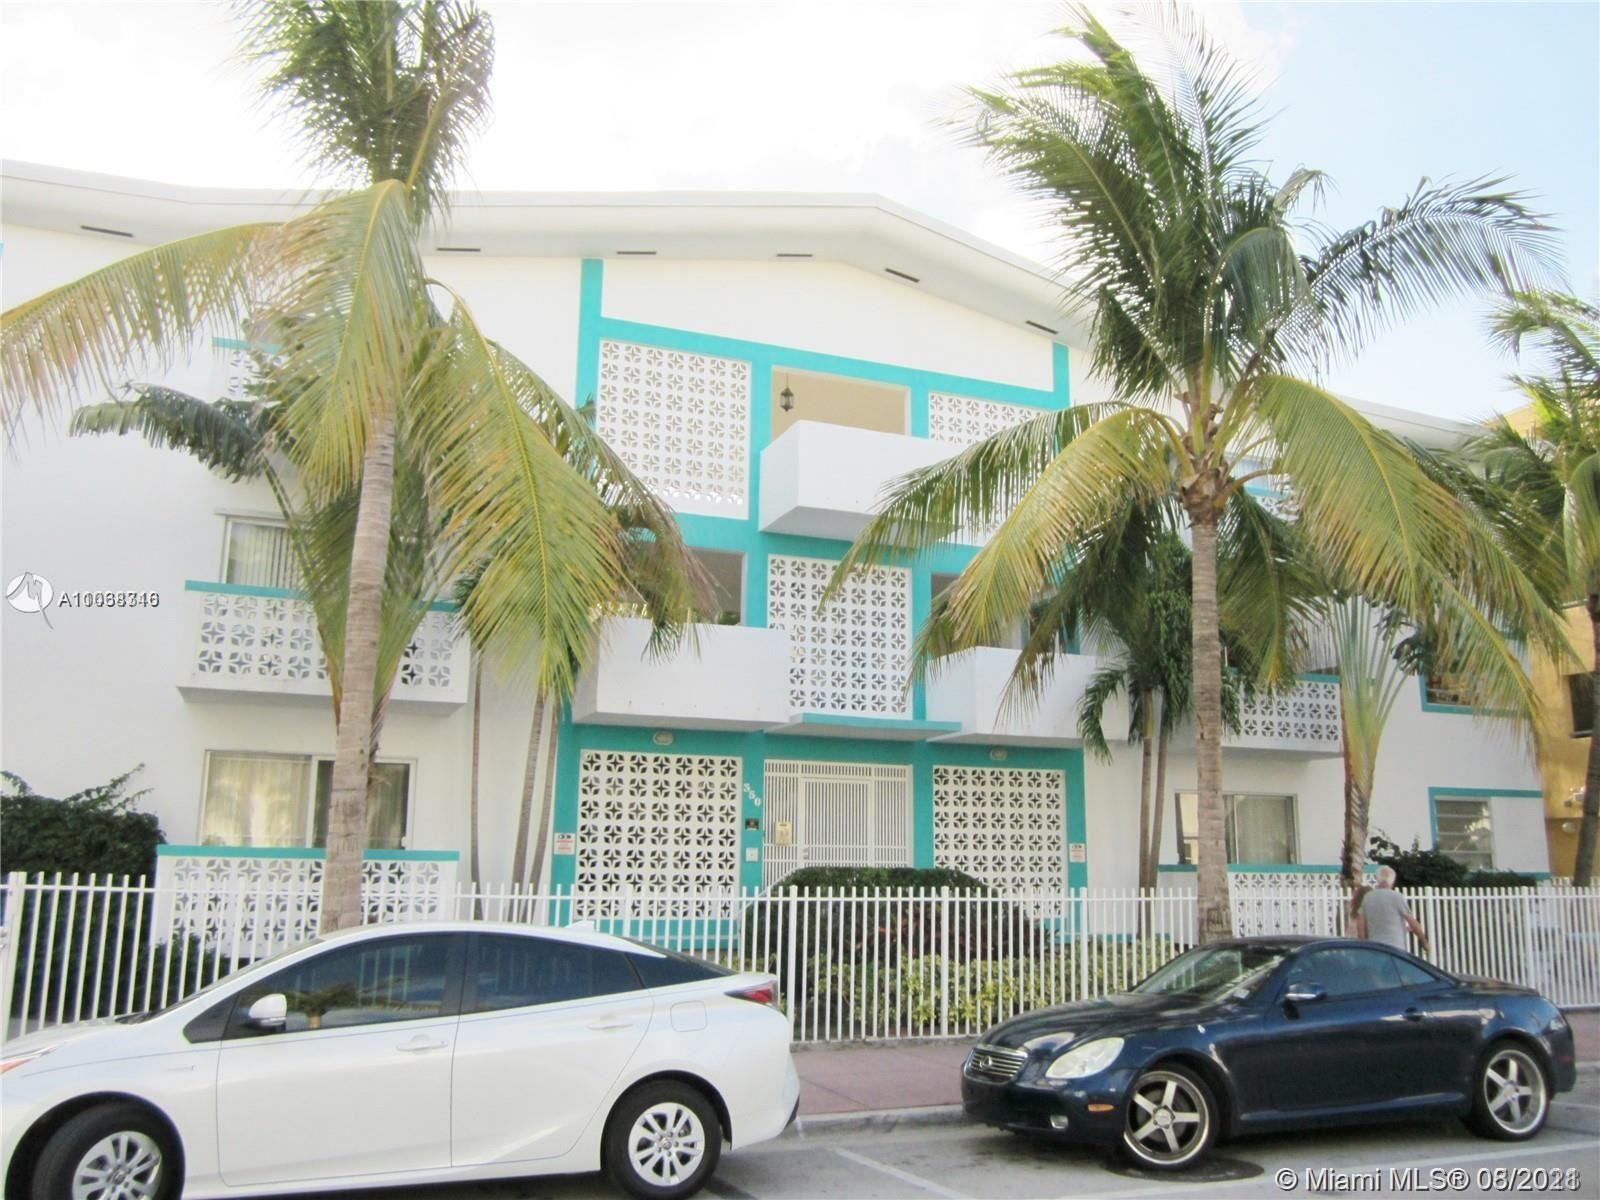 Photo of 350 Collins Ave #108, Miami Beach, FL 33139 (MLS # A11038316)